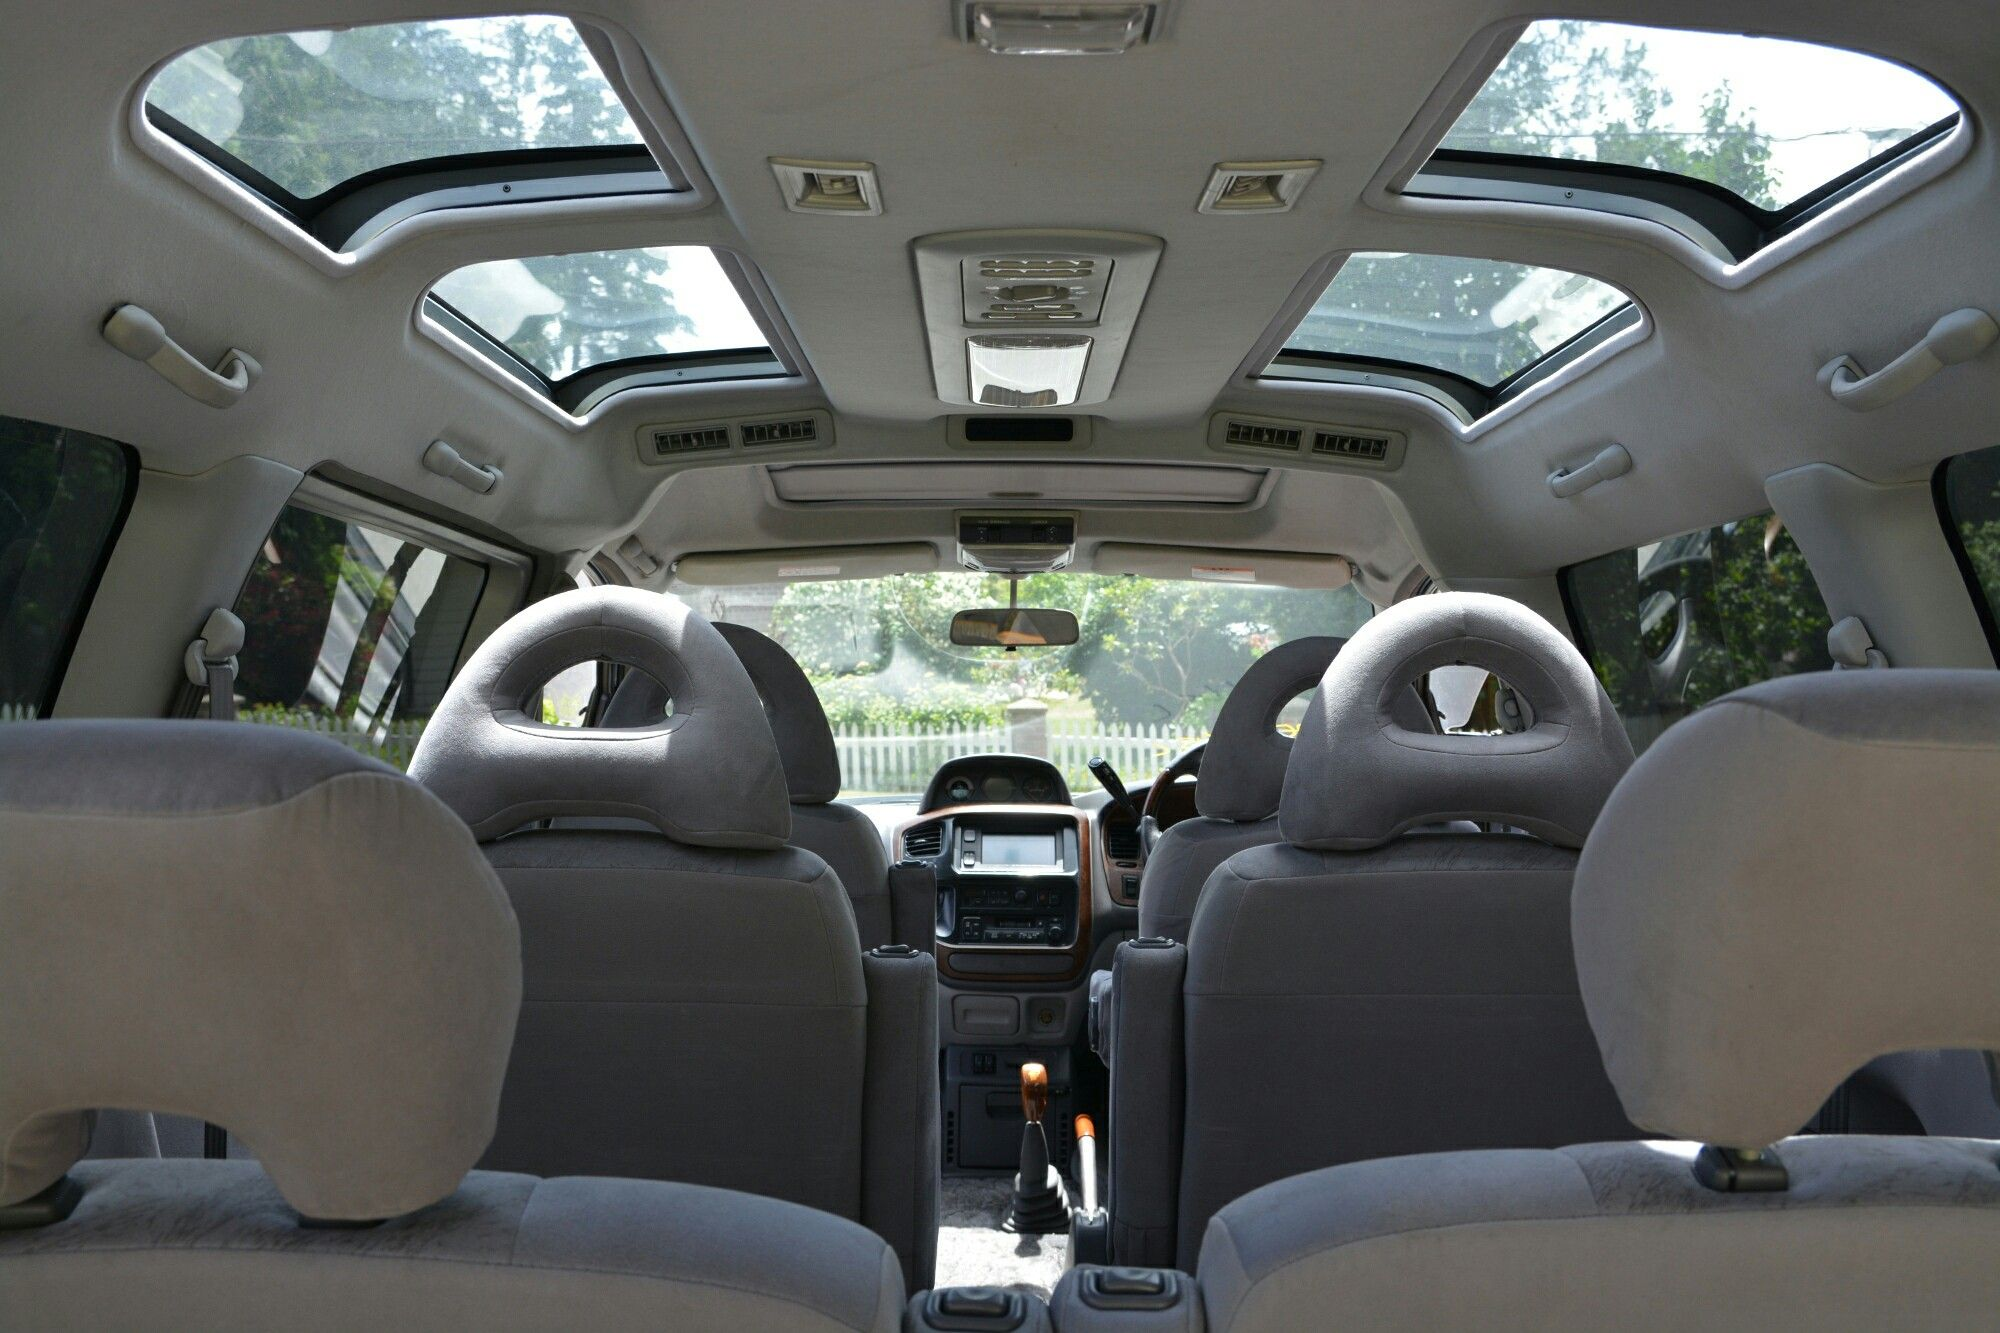 Best Van Ever Mitsubishi Delica Spacegear With A Crystalite Roof Cool Vans Overland Vehicles Delica